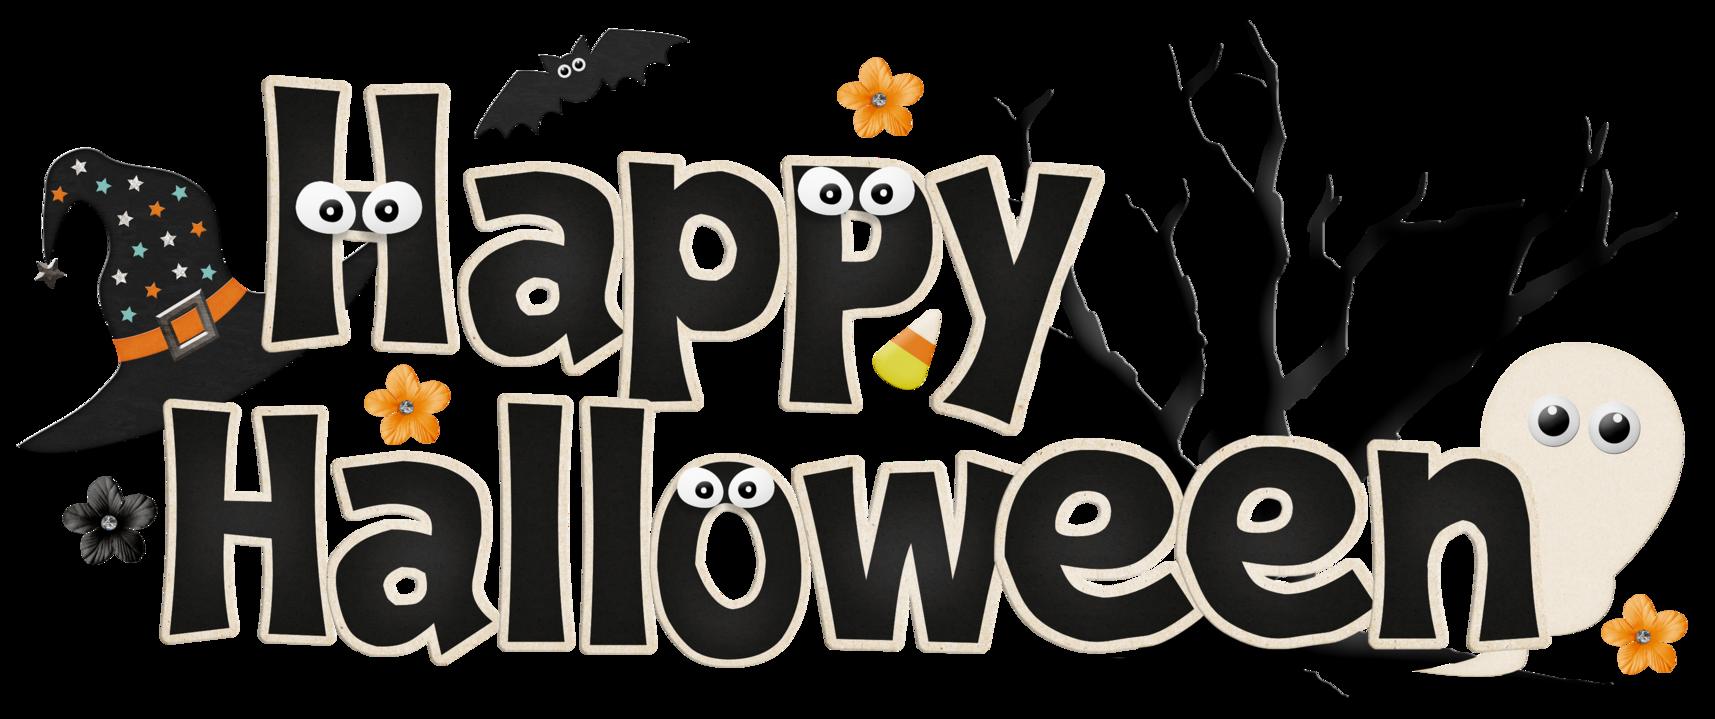 Happy Halloween Logo Festival Collections 1715x719